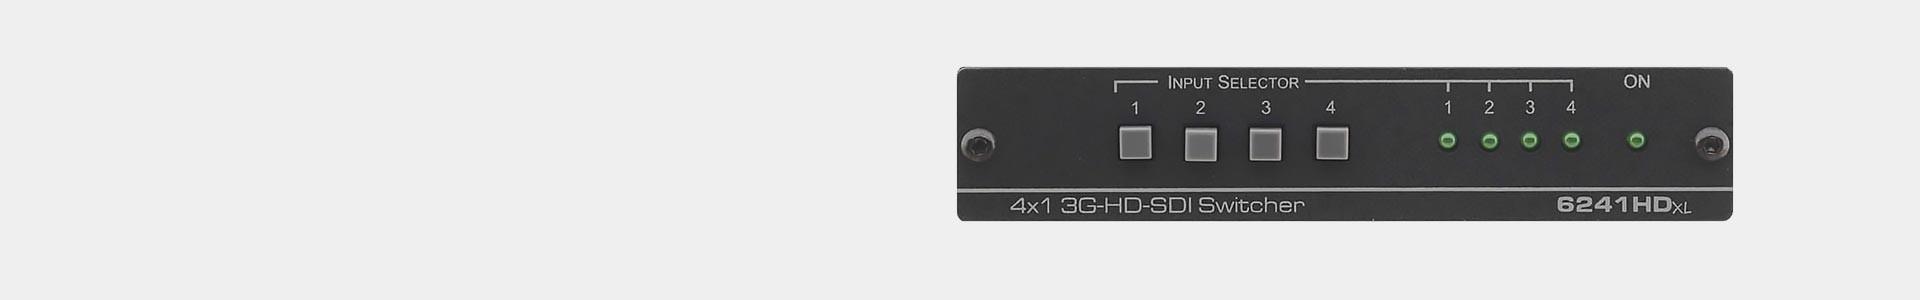 Kramer video switchers - Professional quality - Avacab